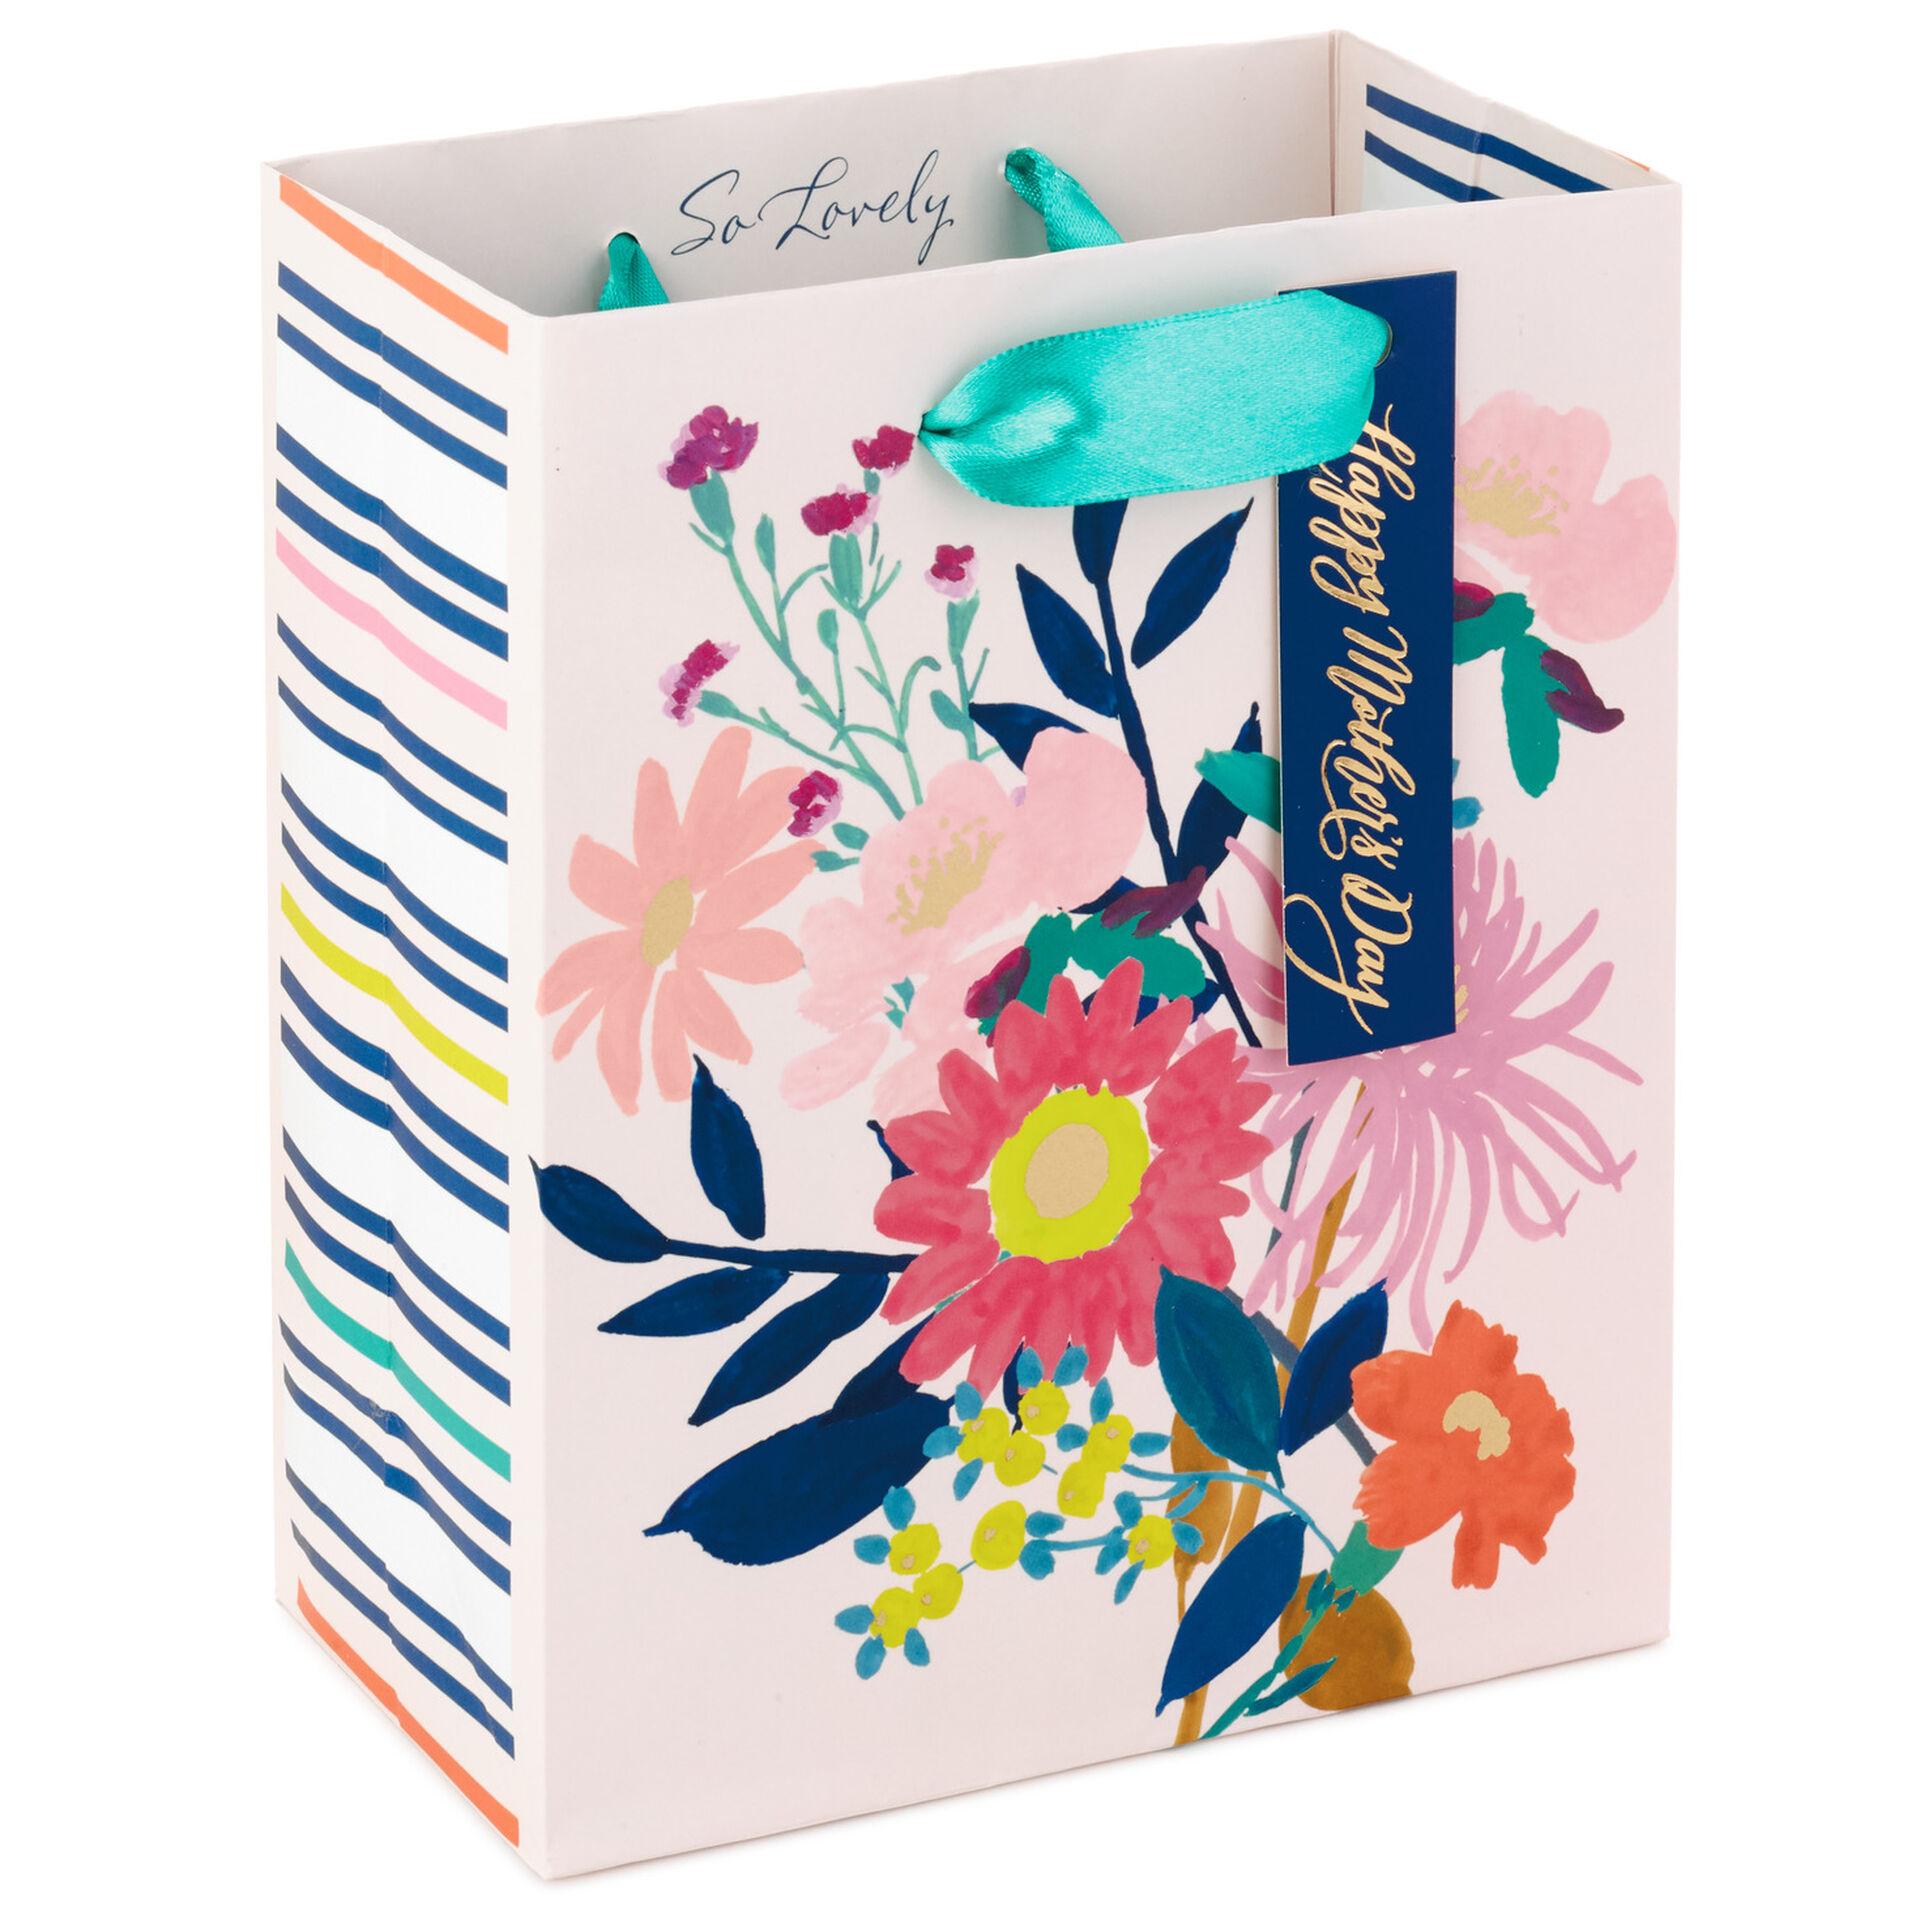 https://0201.nccdn.net/1_2/000/000/122/d73/floral-happy-mothers-day-small-gift-bag_299egb6580_01.jpg